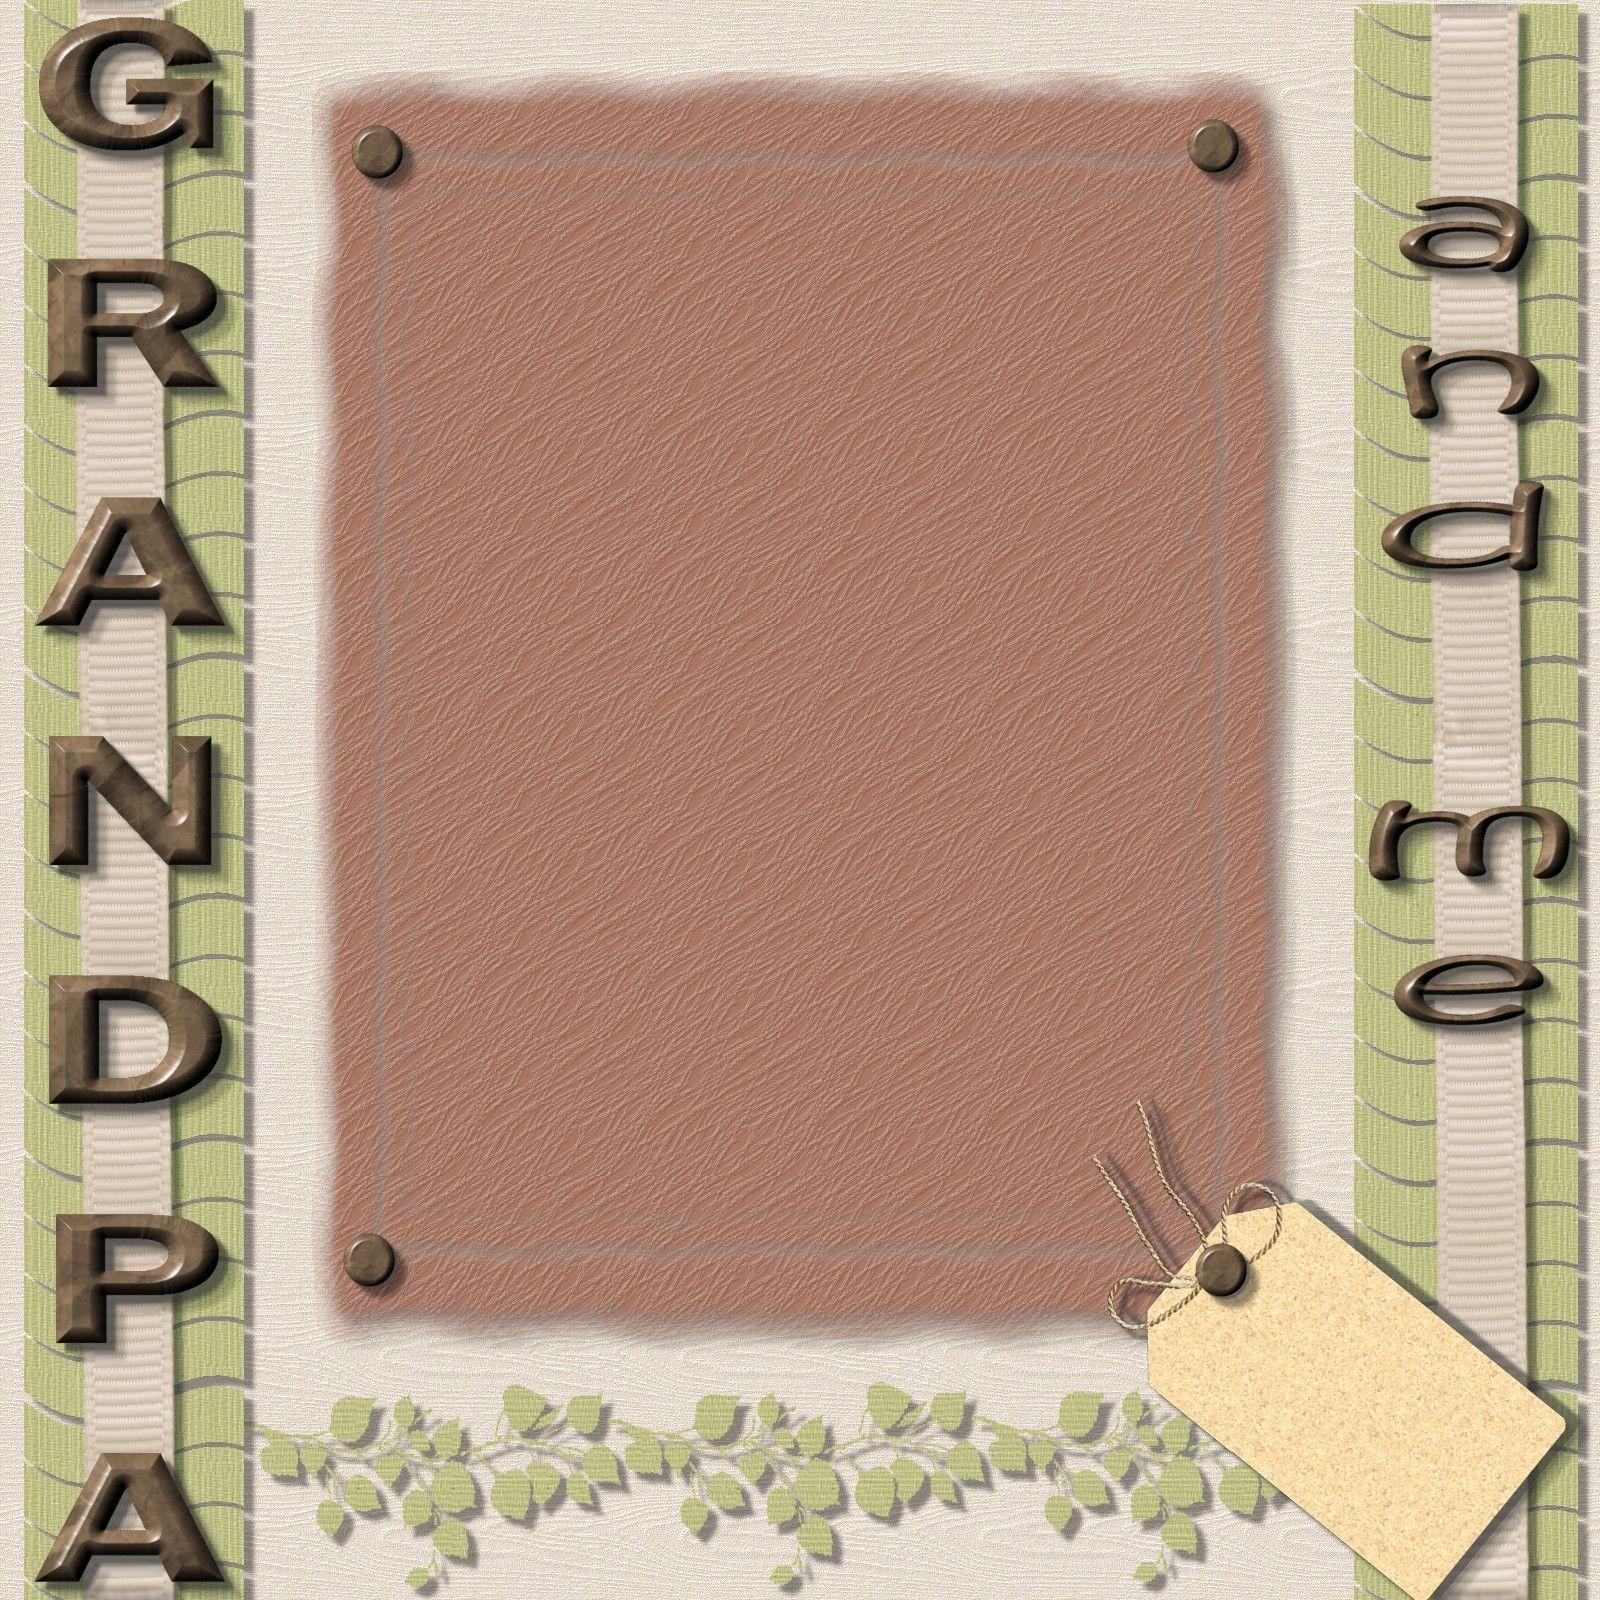 Scrapbook ideas grandma - Grandma Grandpa With Baby Scrapbook Page Ideas Angelwithin S Scrapbooks Grandpa